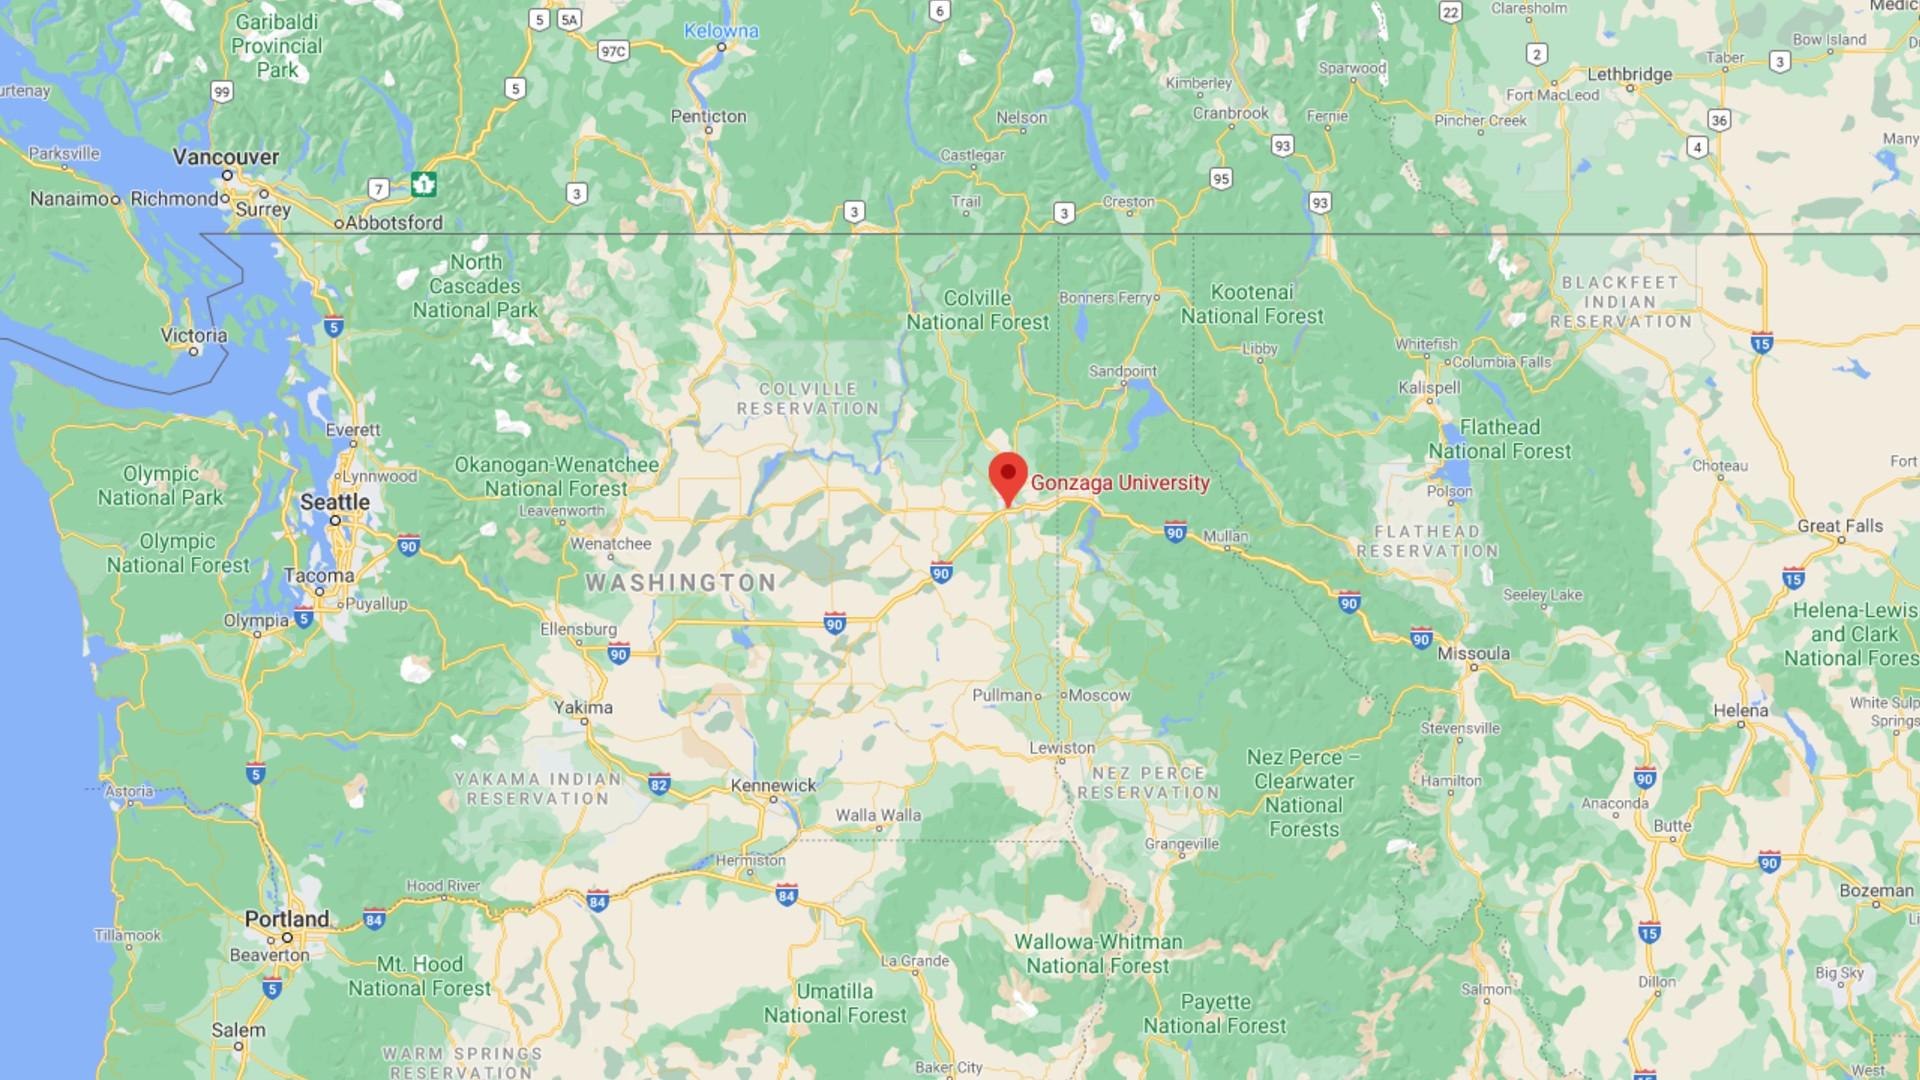 gonzaga location map 030821 ftrjpg b7fqommmy9b81059jnq0n4jkz